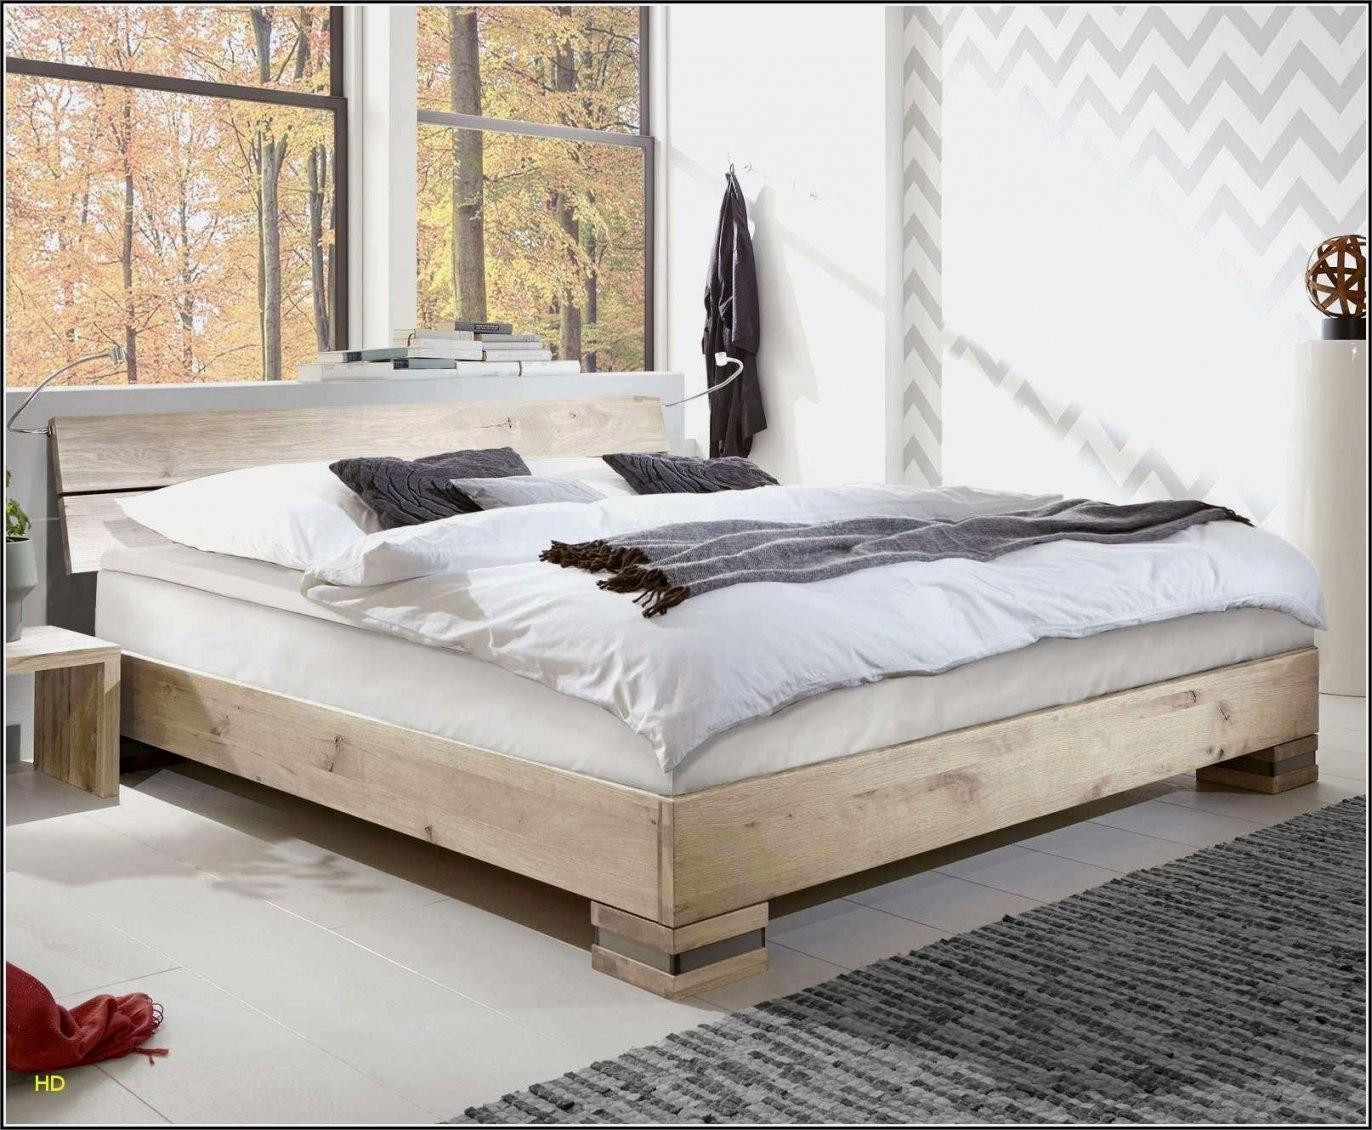 Lattenroste Bett 160×200 Mit Lattenrost Und Matratze von Bett 160X200 Mit Lattenrost Und Matratze Bild